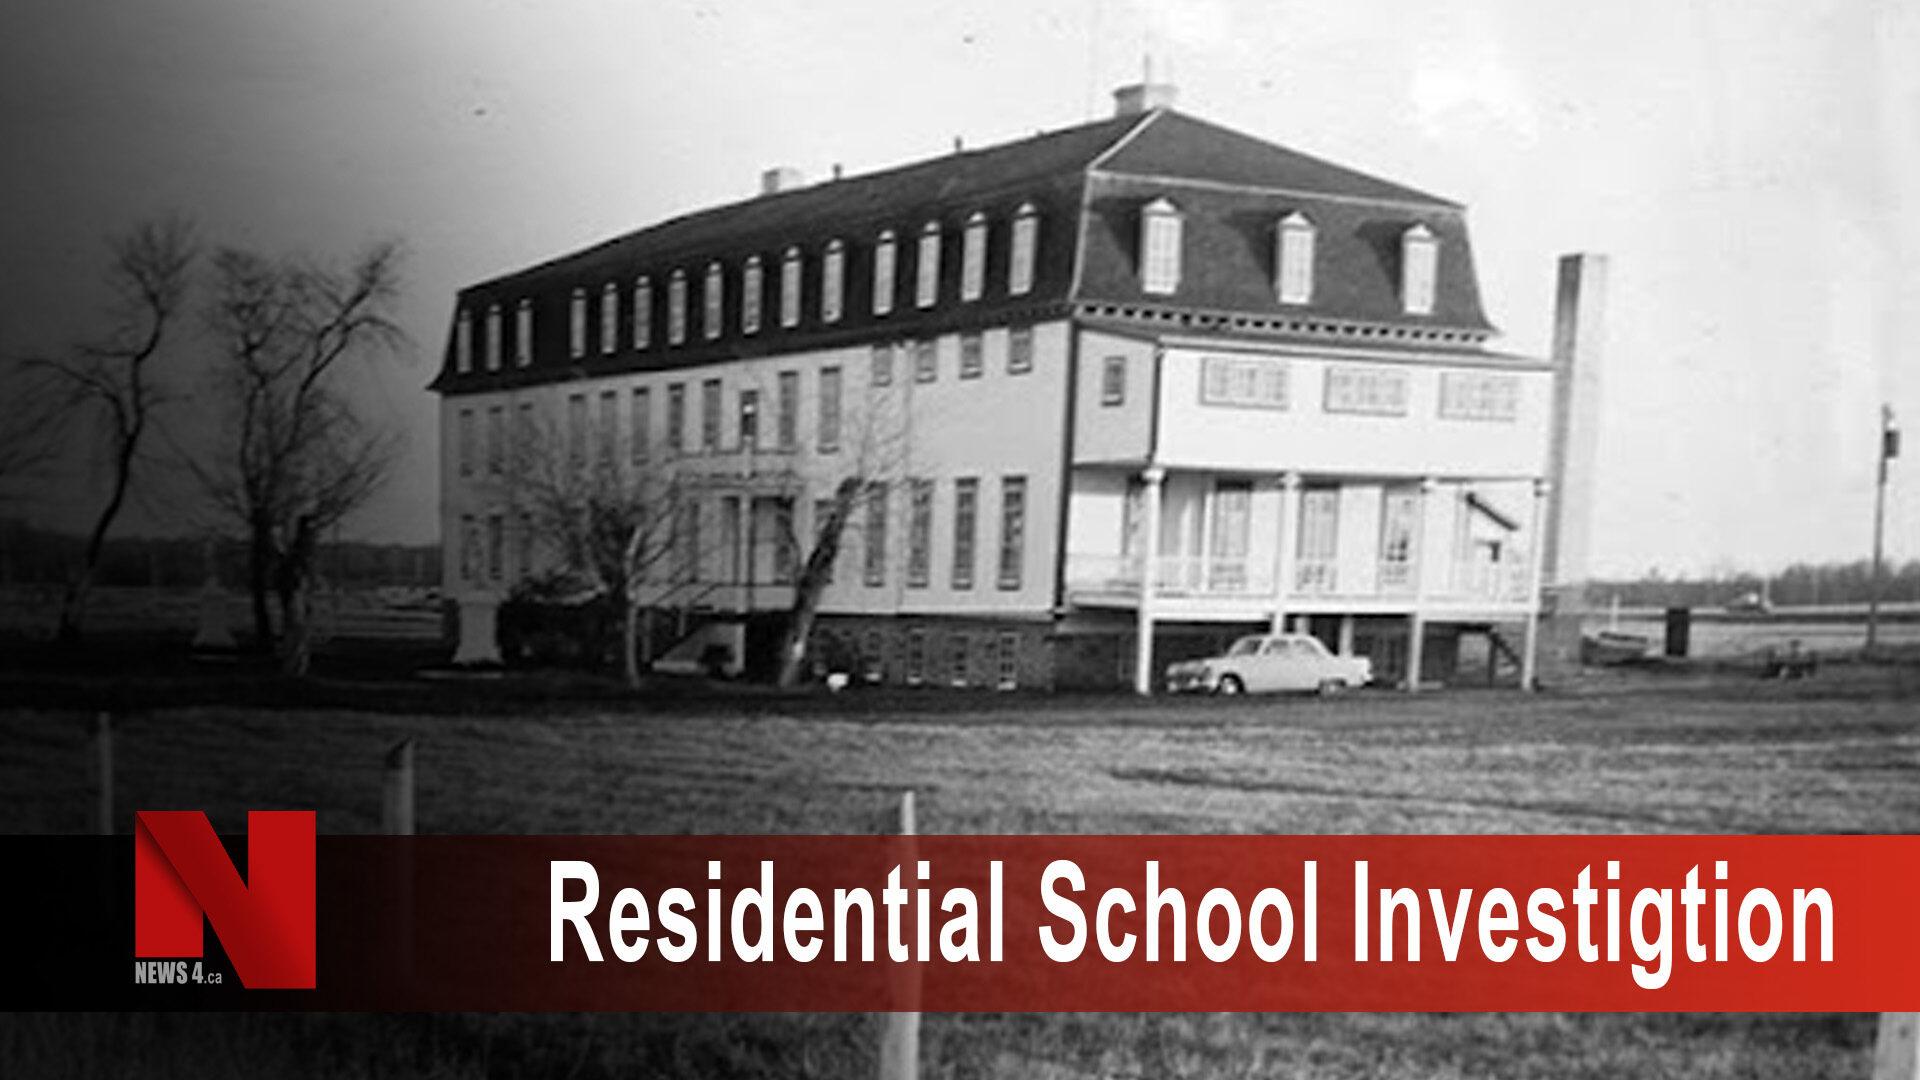 Residential School Investigation